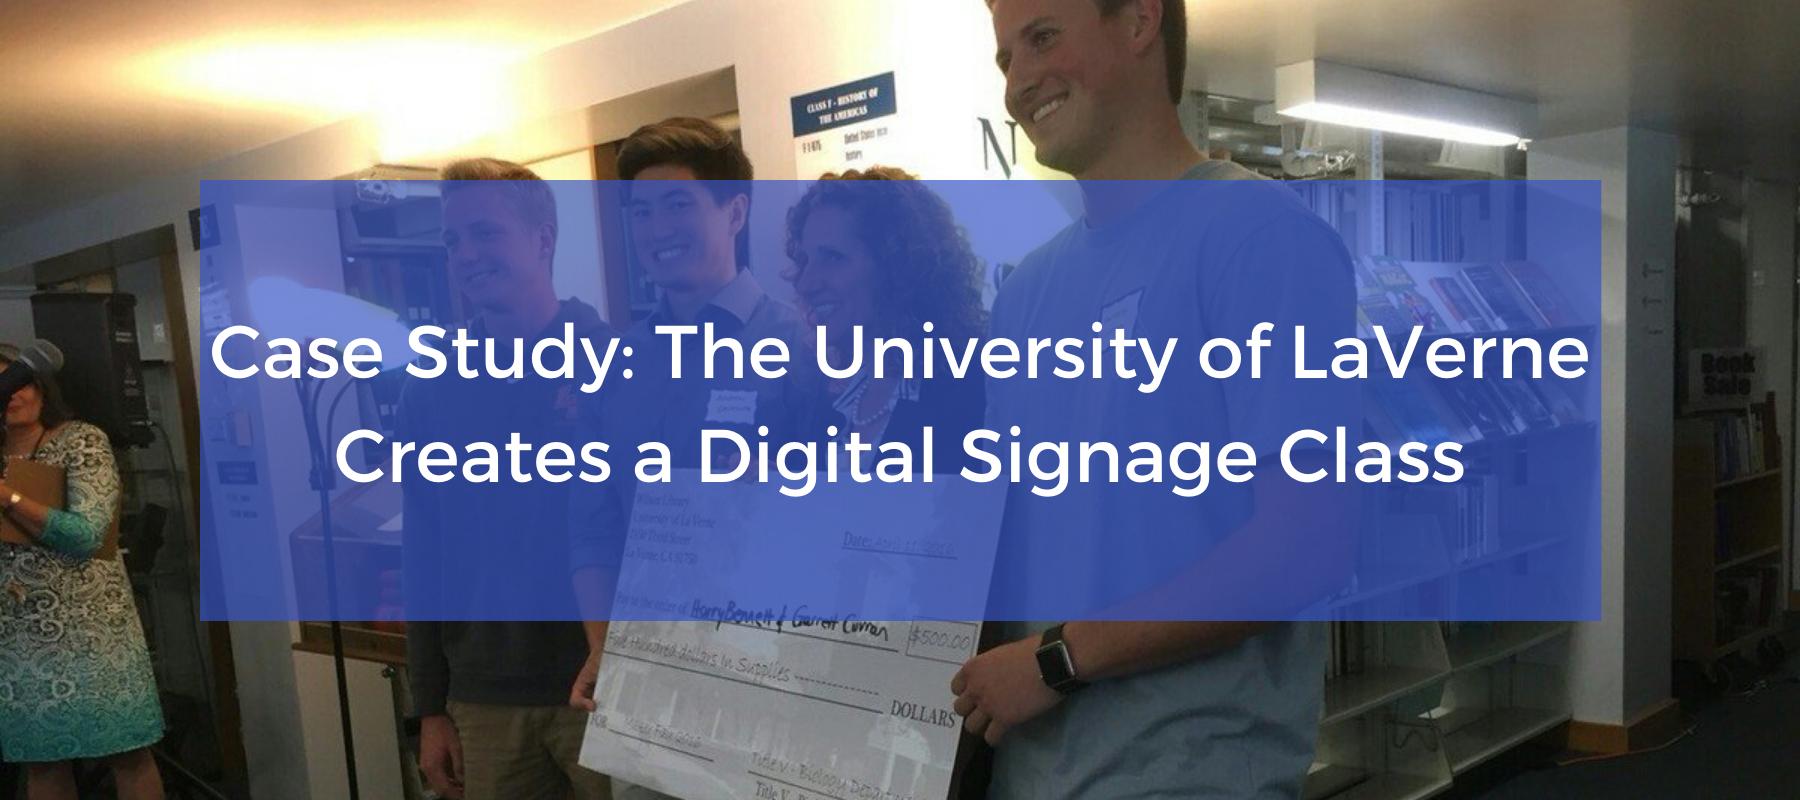 The University of LaVerne Creates a Digital Signage Class